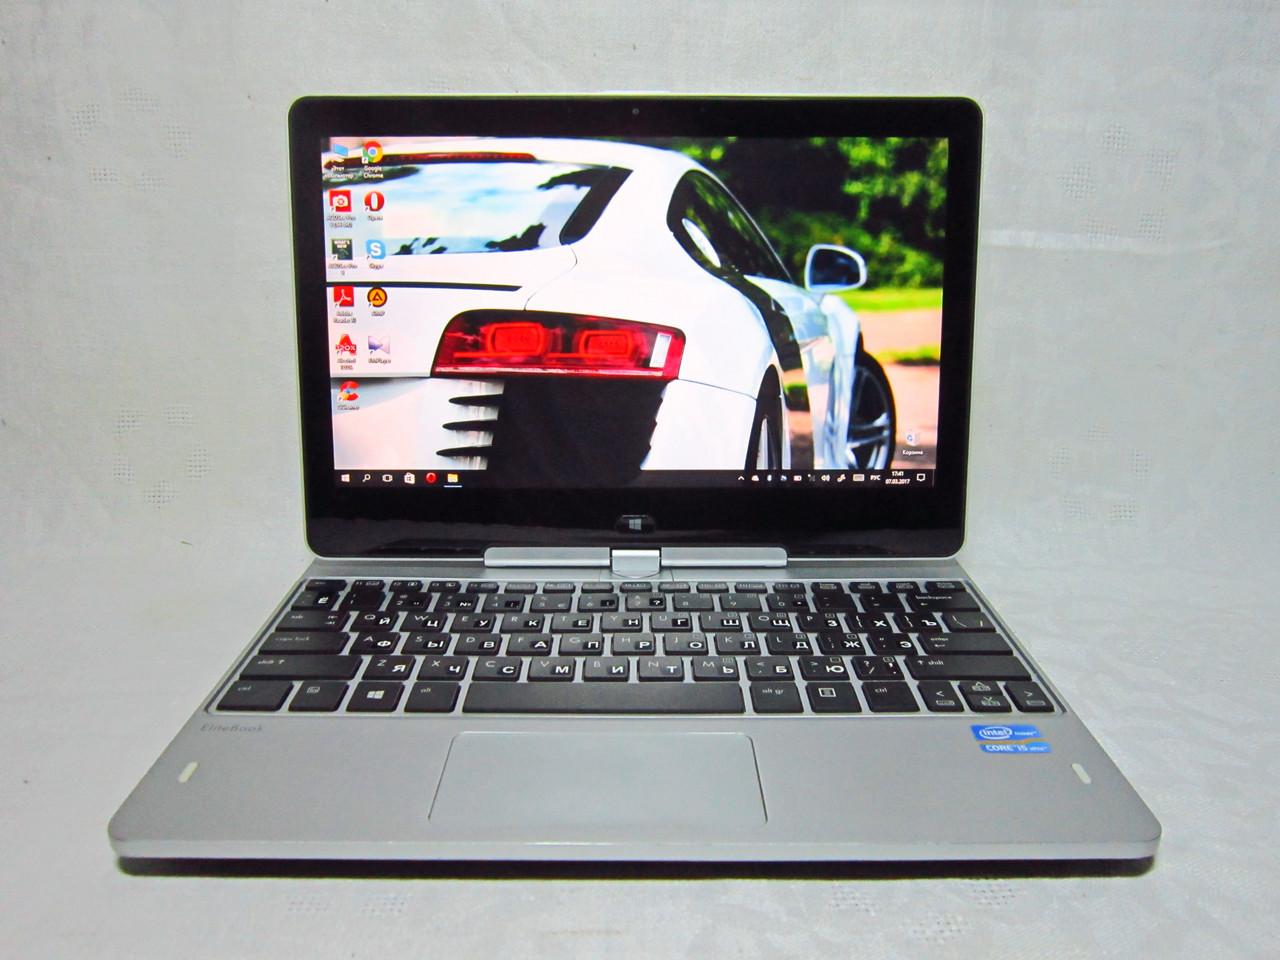 Б/у ноутбук HP  810 G1 на i5/ssd/8gb ram